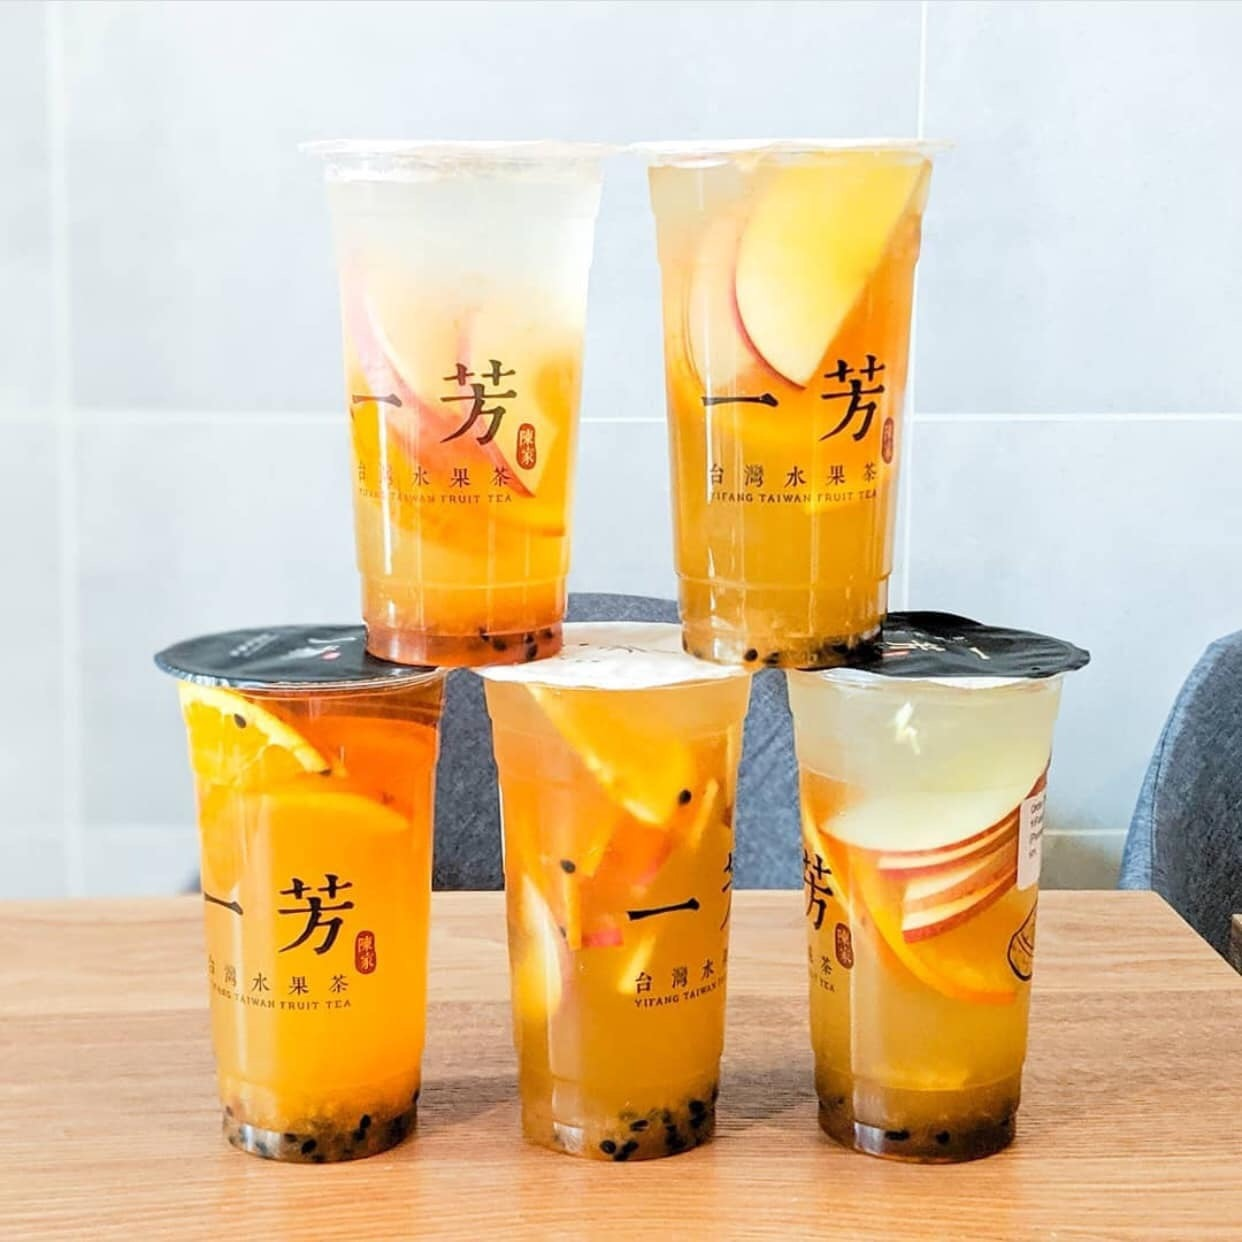 yifang-viet-nam-review